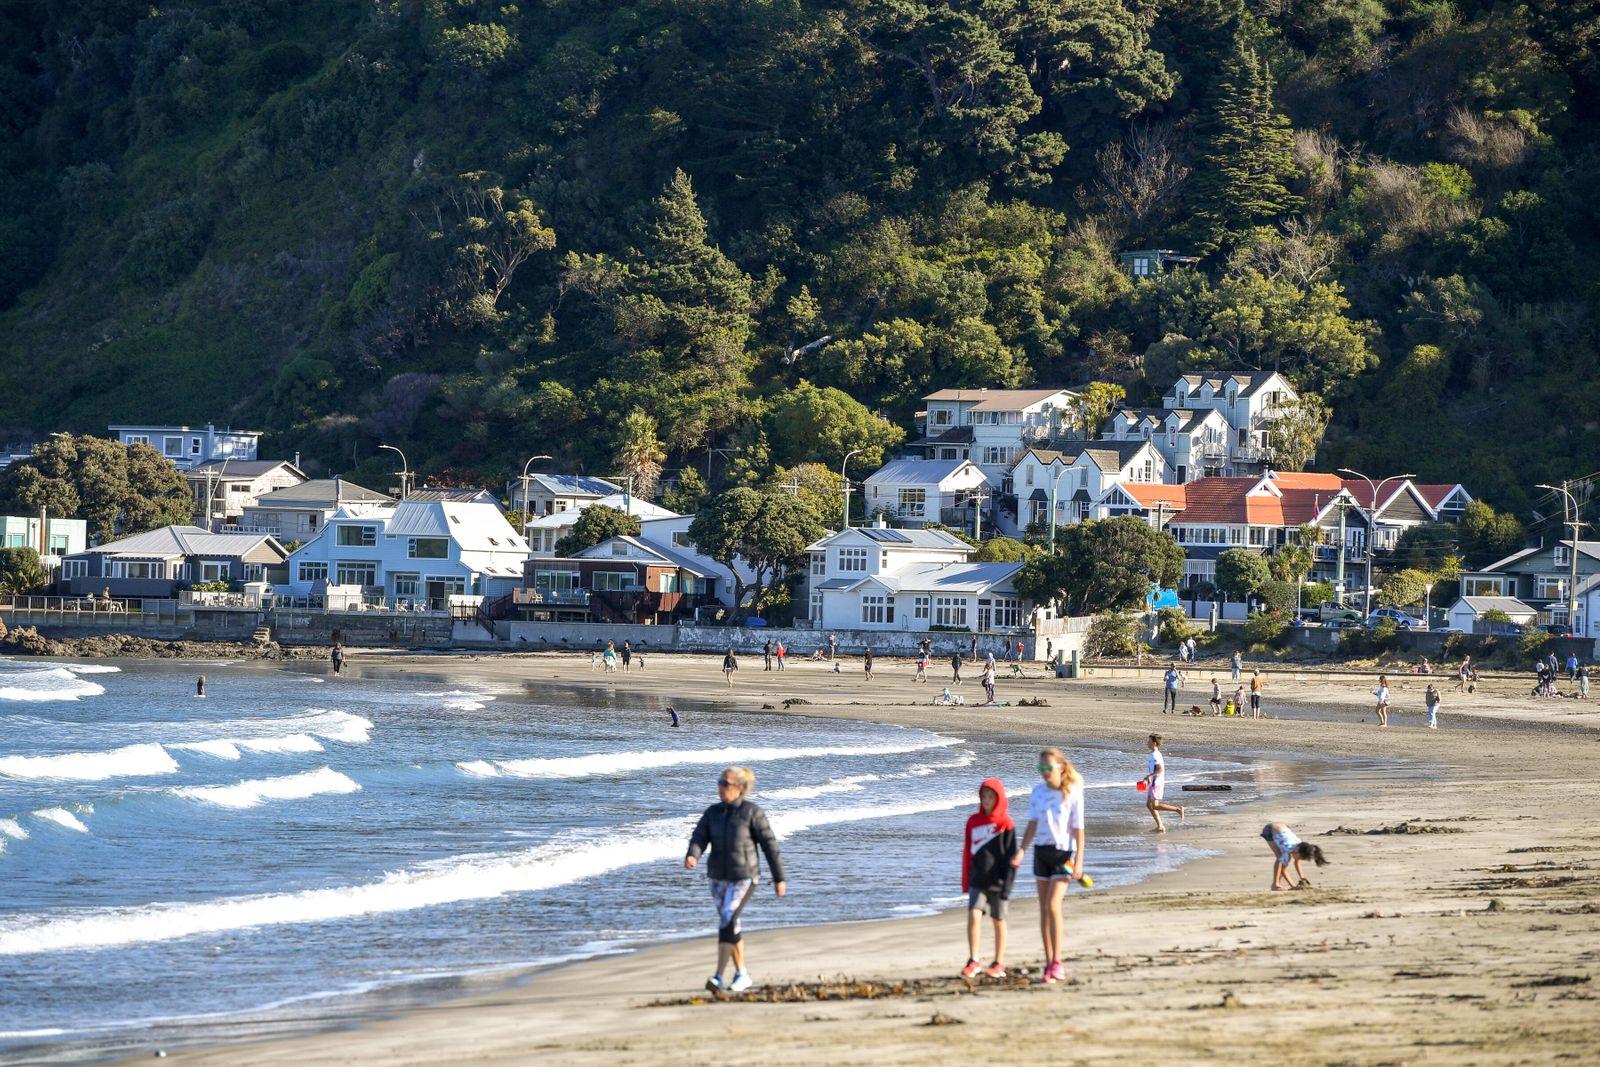 (200428) -- WELLINGTON, April 28, 2020 -- People walk on a beach in Wellington, New Zealand, April 28, 2020. New Zealan